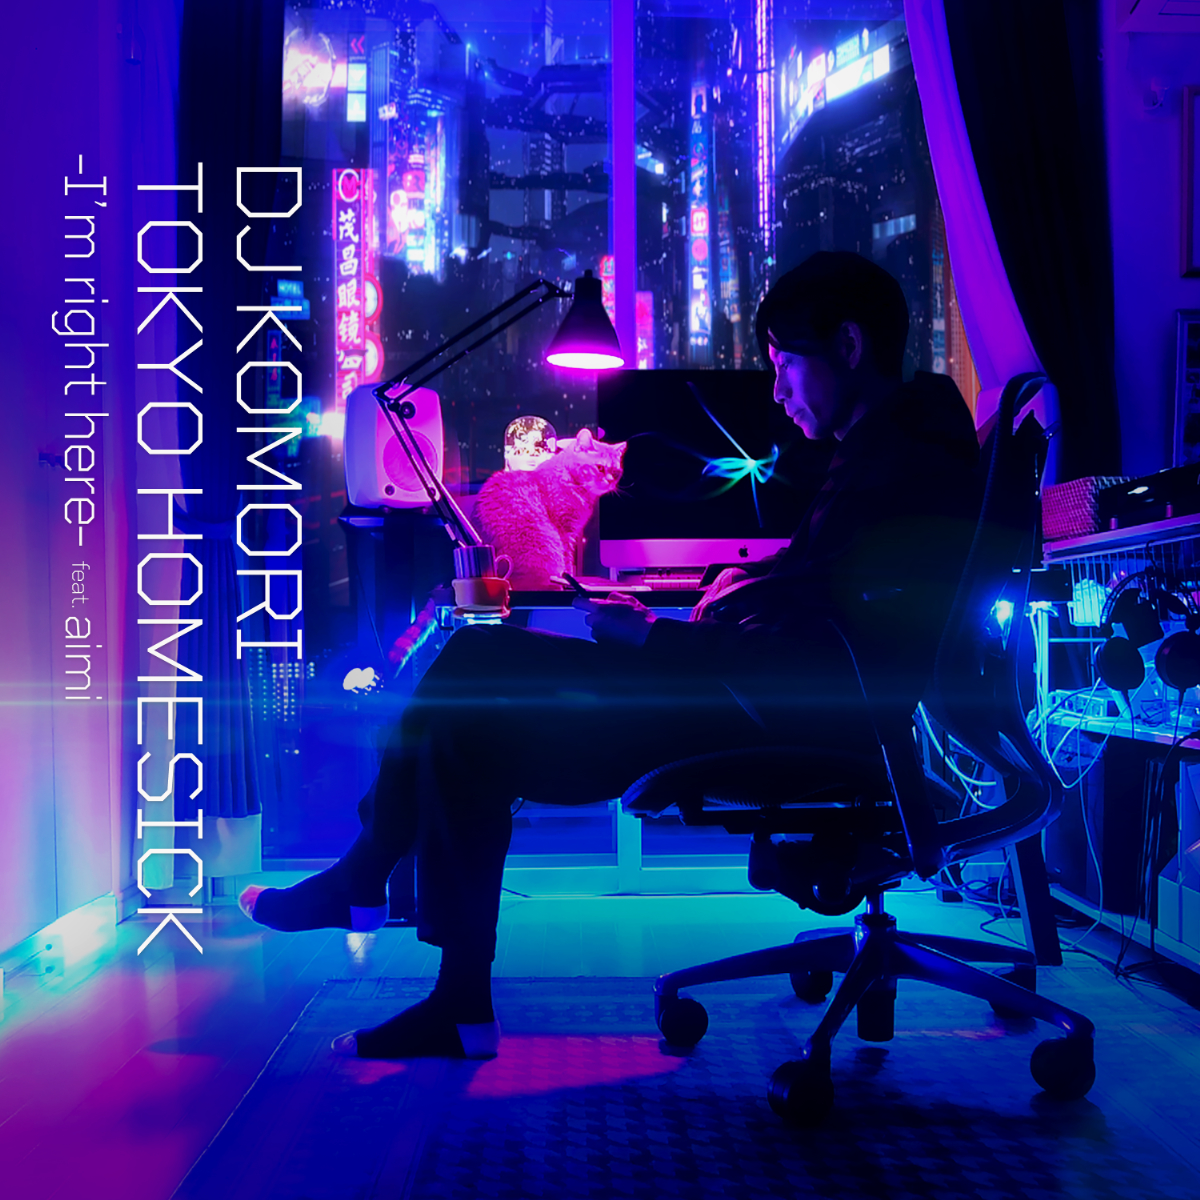 「TOKYO HOMESICK - I'm right here - feat. aimi」ジャケット